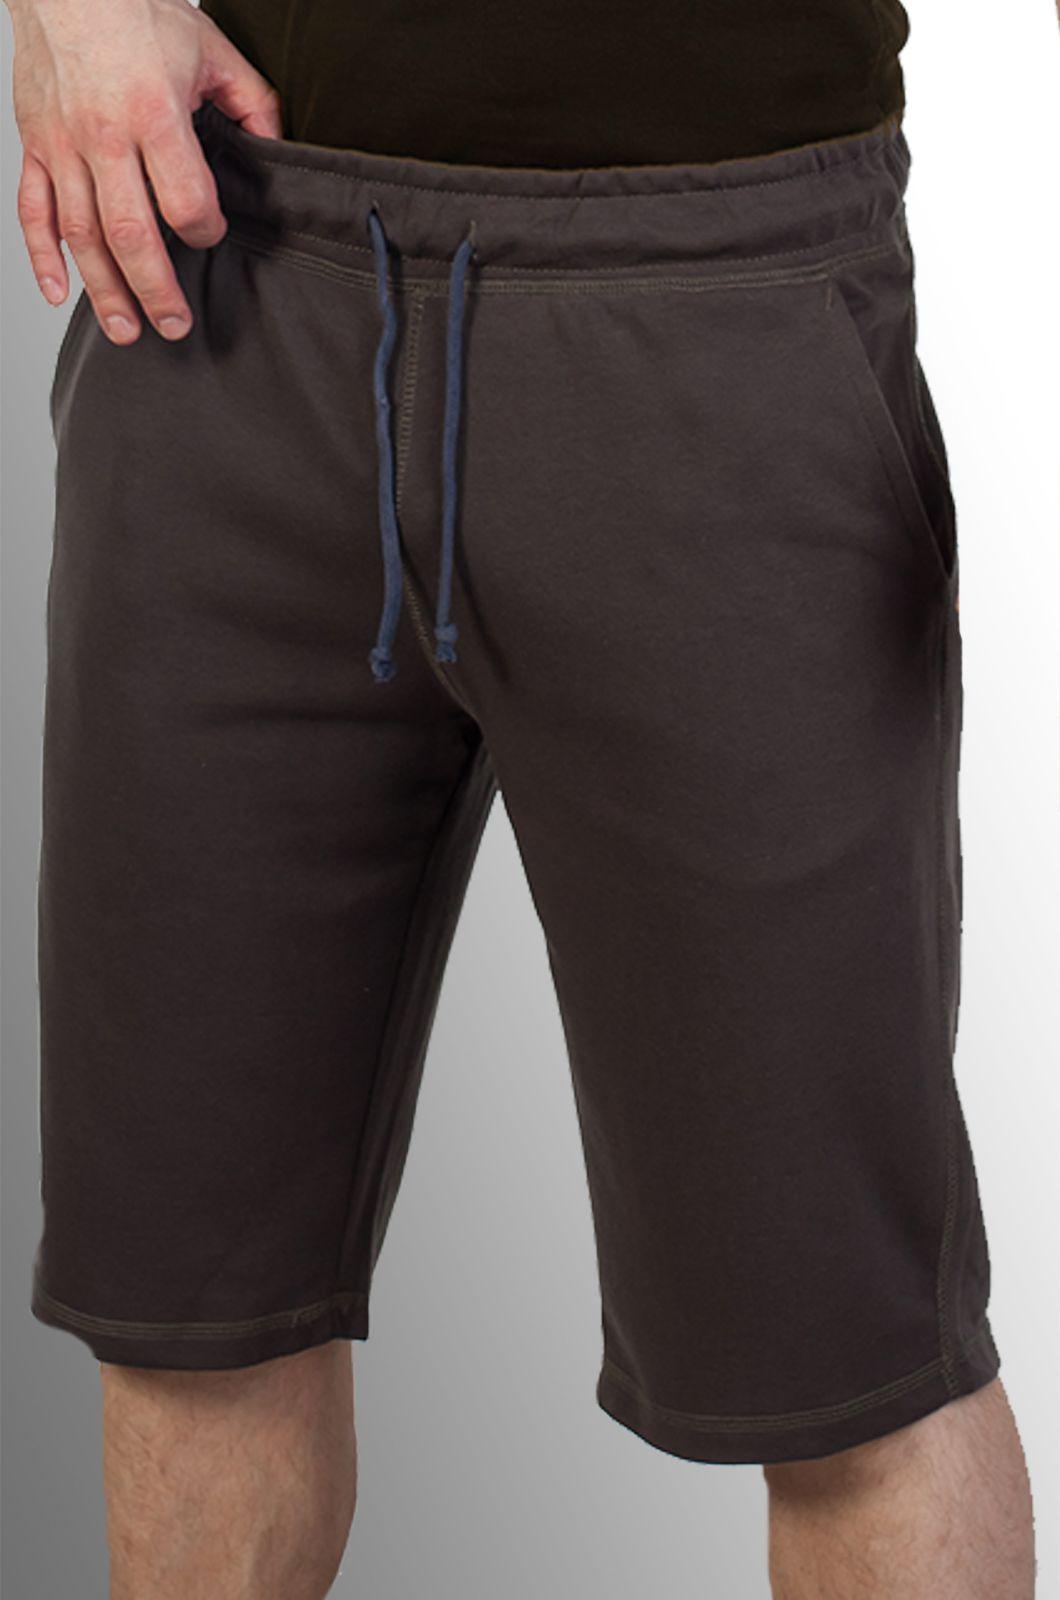 Коричневые шорты мужские из трикотажа